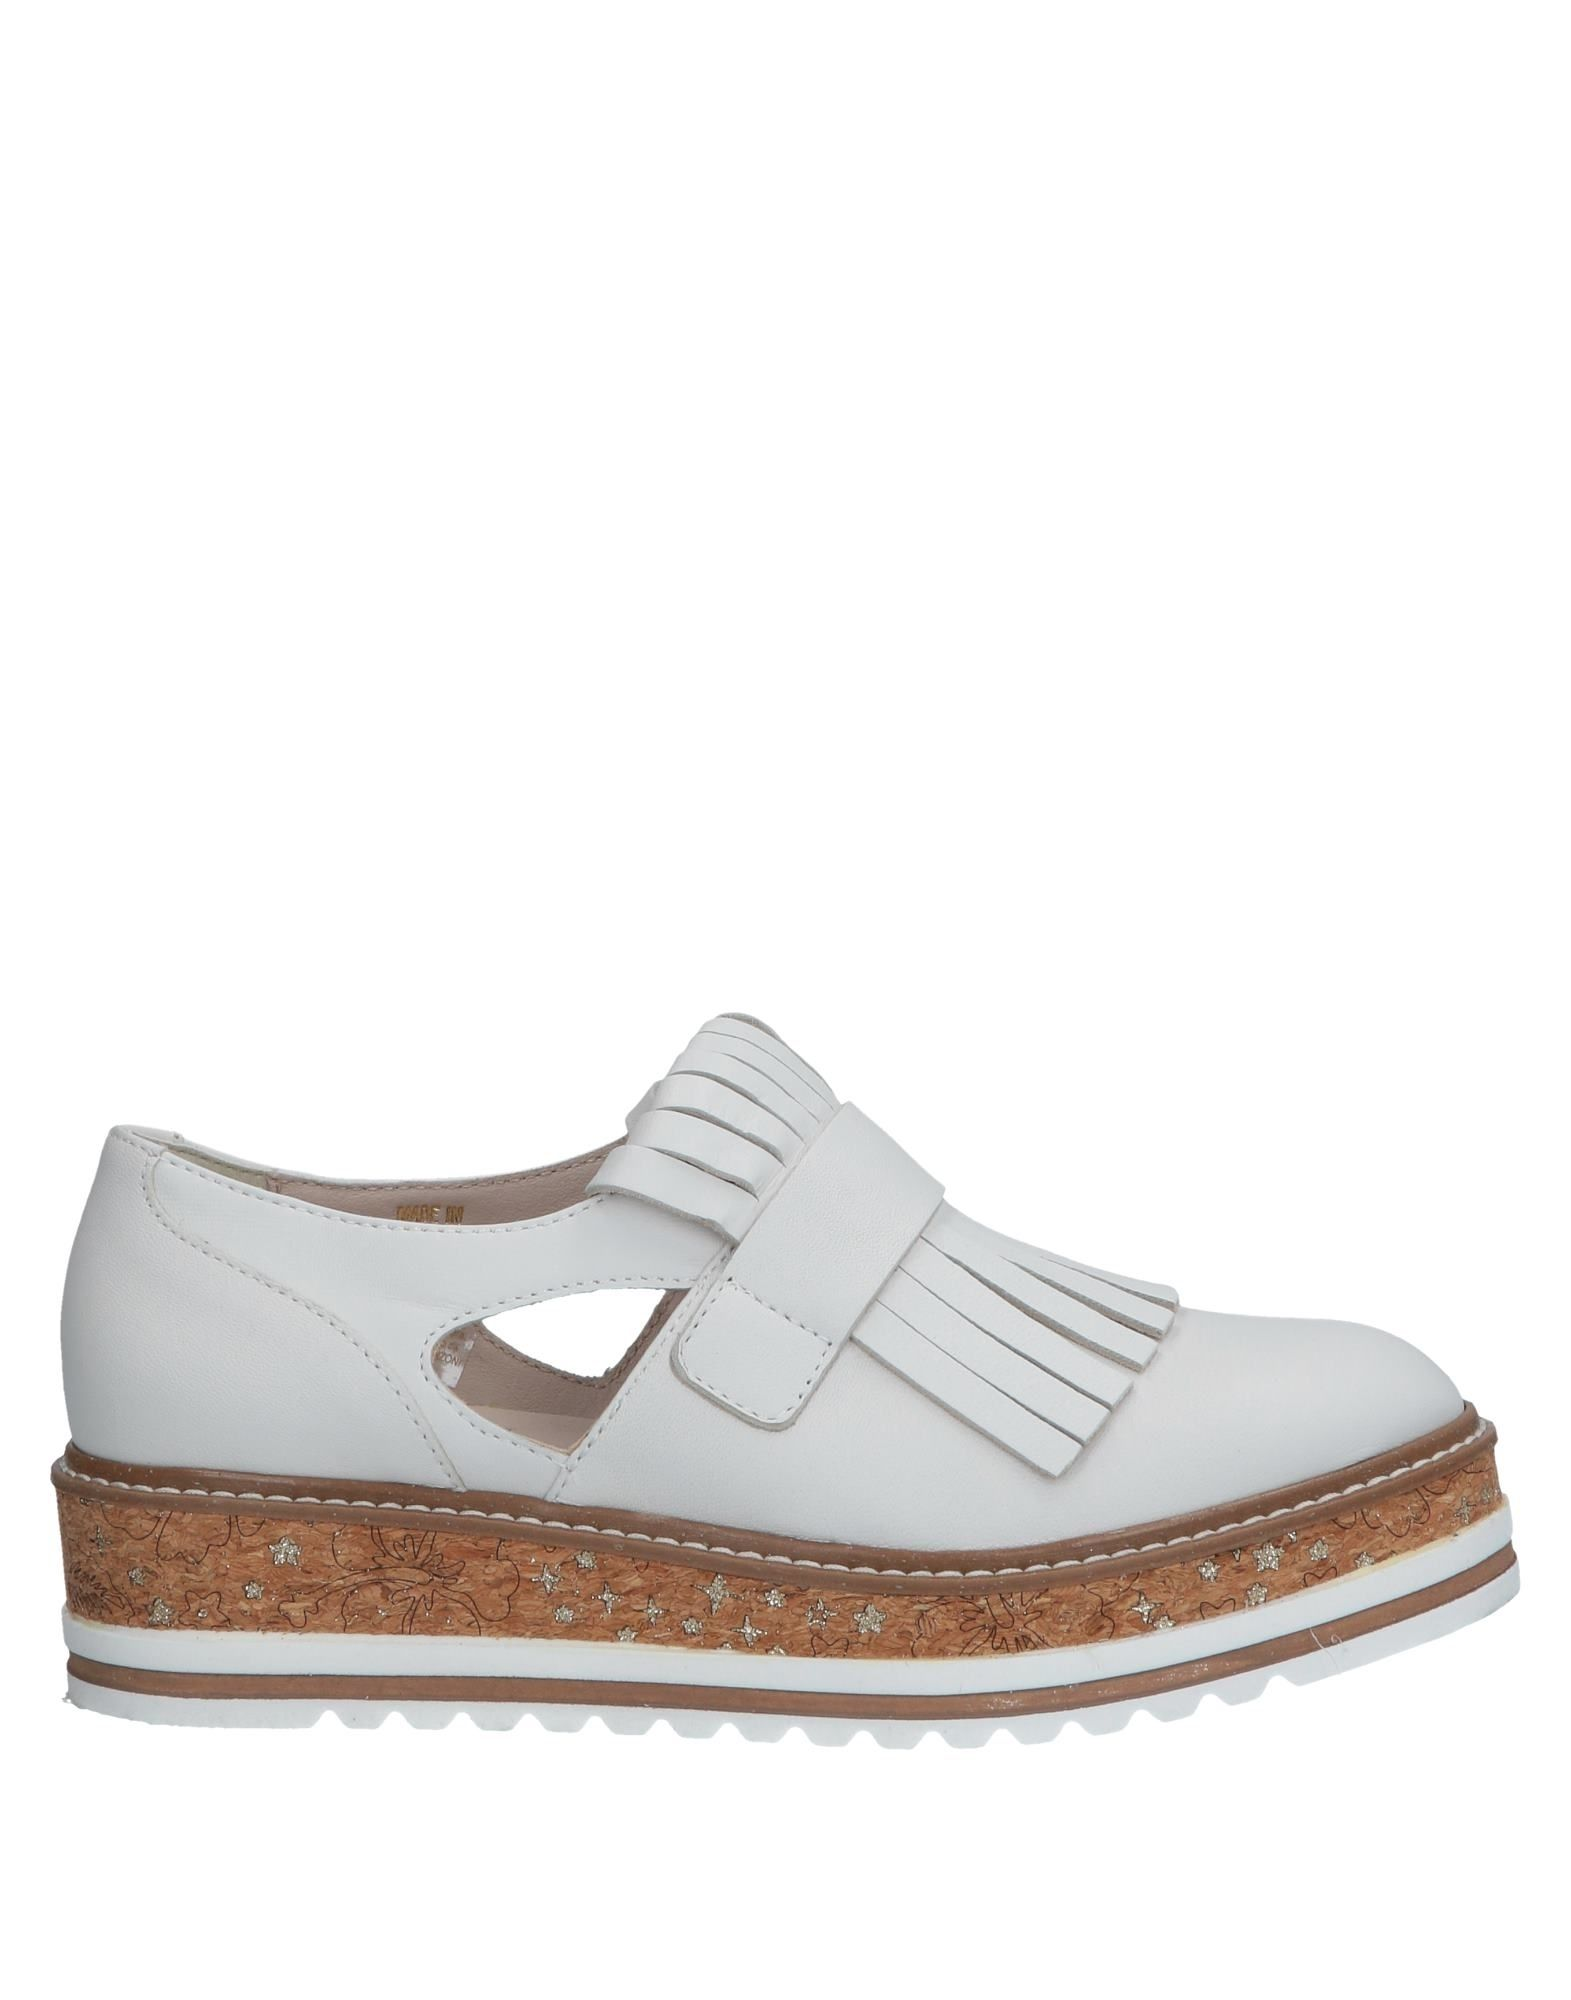 Stilvolle billige Mokassins Schuhe Tosca Blu Schuhes Mokassins billige Damen  11571641SL 627af2